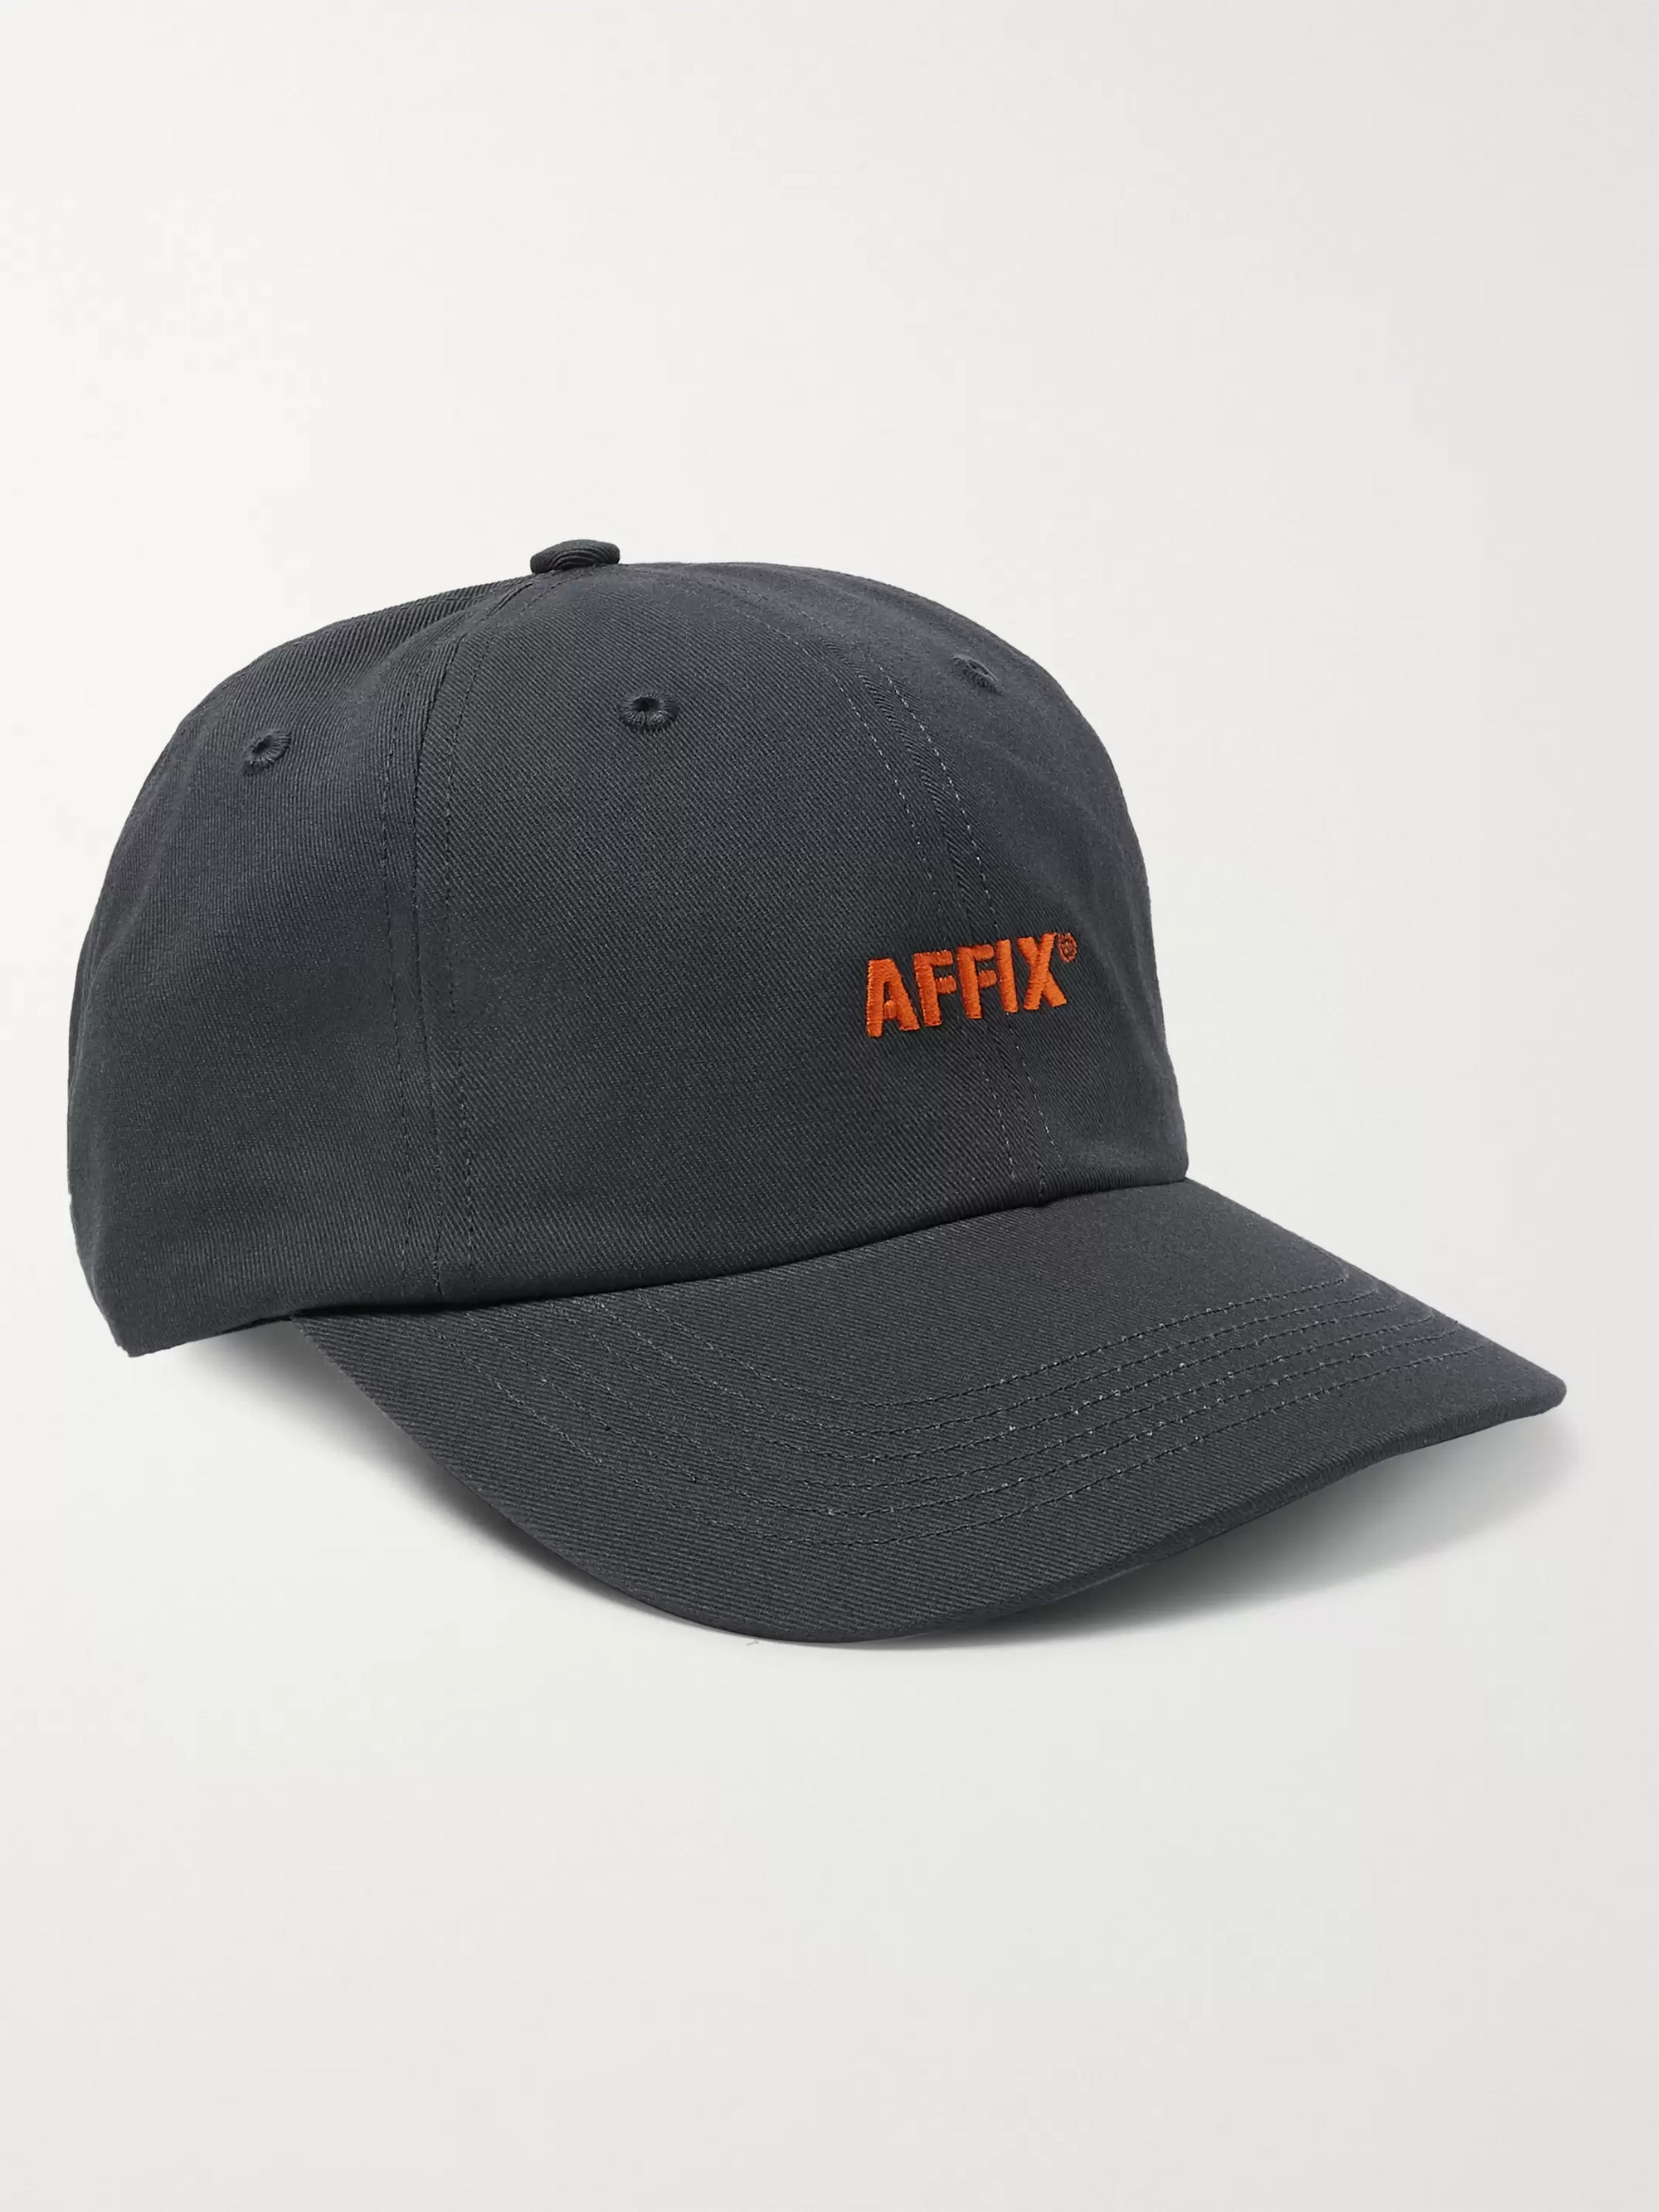 b51d06facbca Men's Baseball Caps | Designer Accessories | MR PORTER